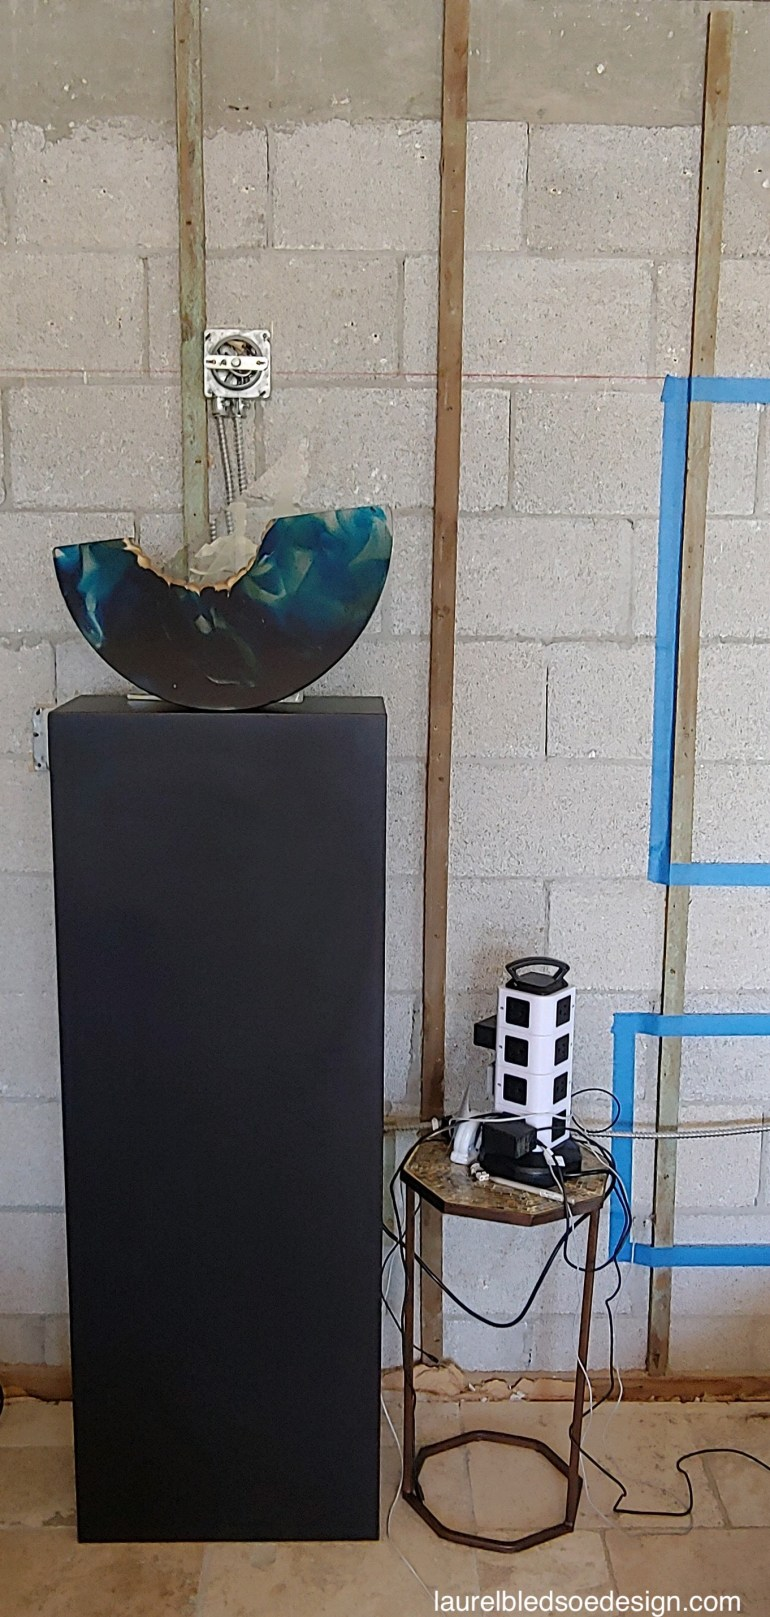 laurelbledsodesign-wall-hung-tv-contruction